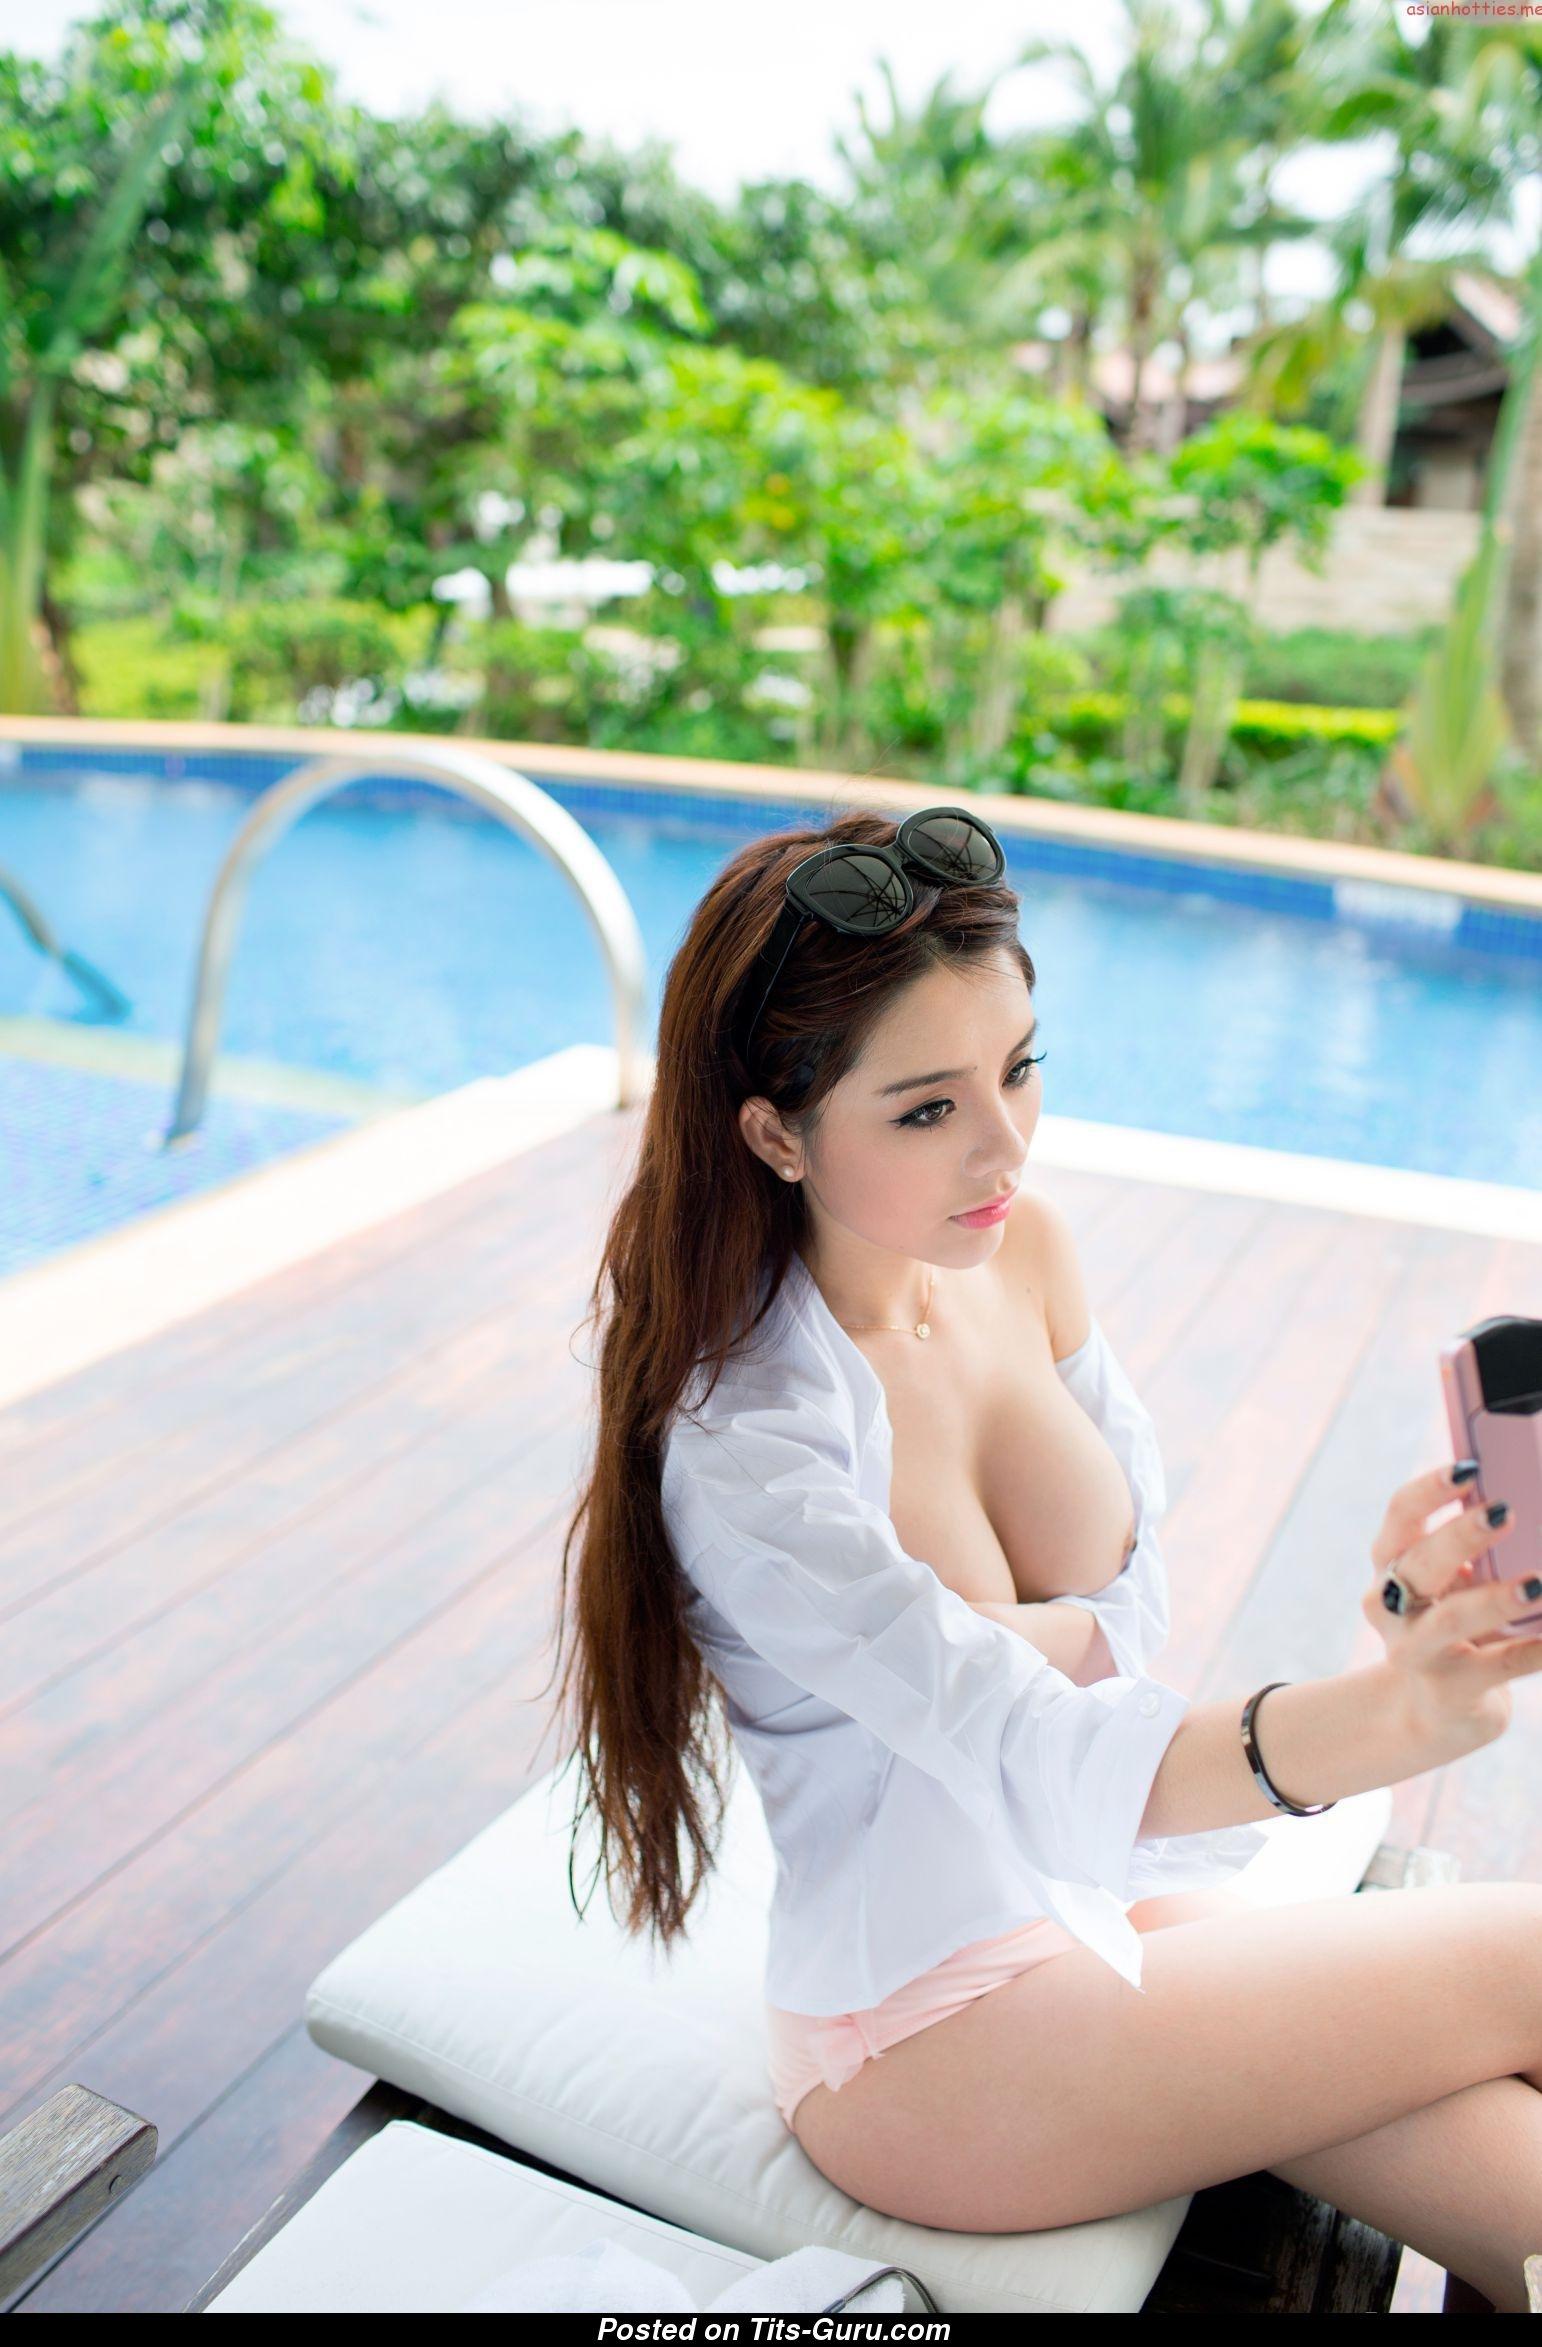 chat best escort sites